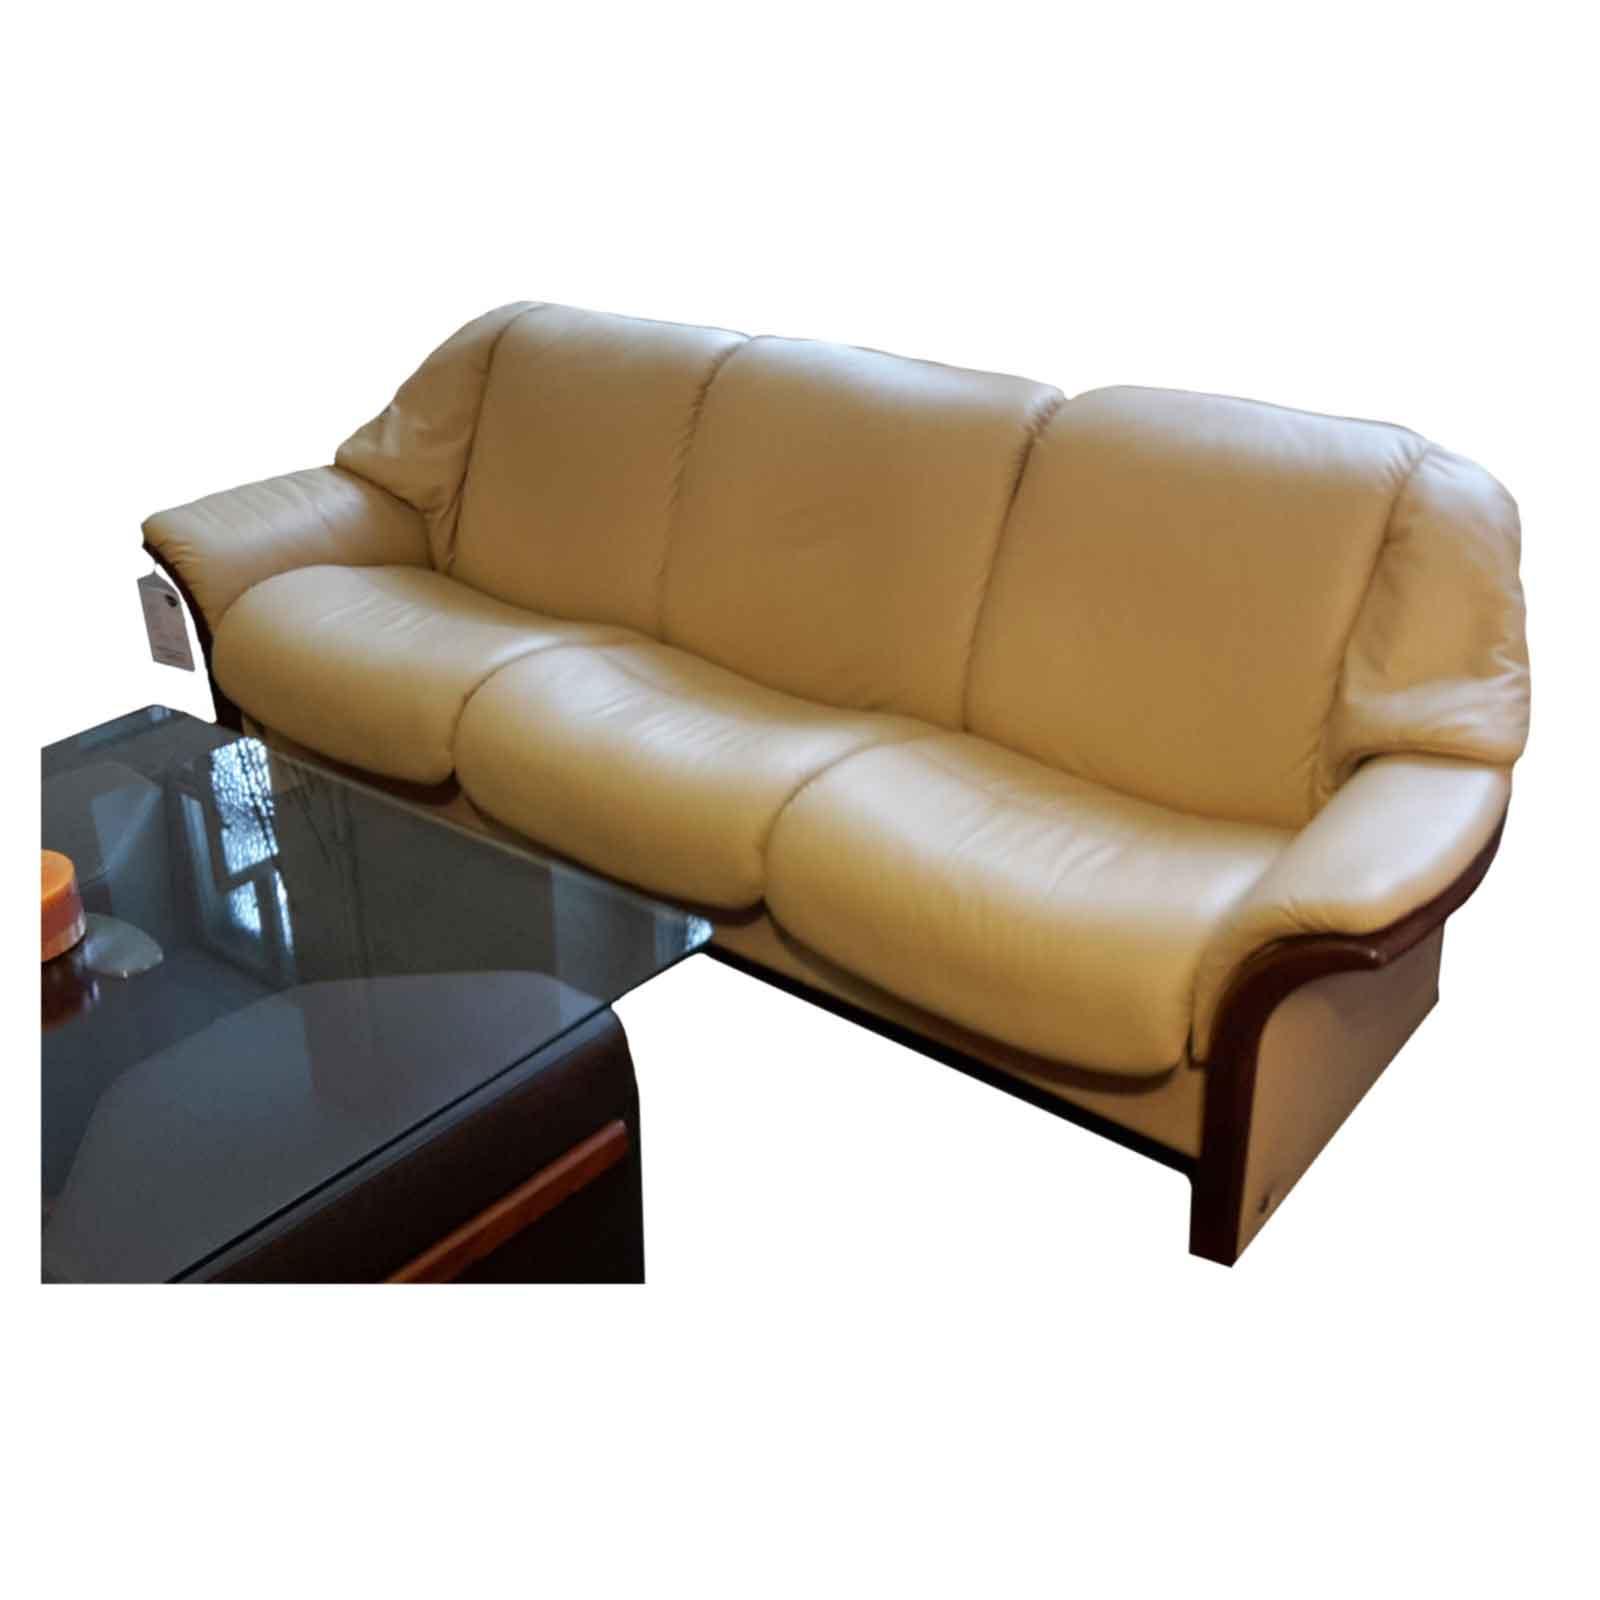 ausstellungsst ck stressless sofa granada camel braun. Black Bedroom Furniture Sets. Home Design Ideas